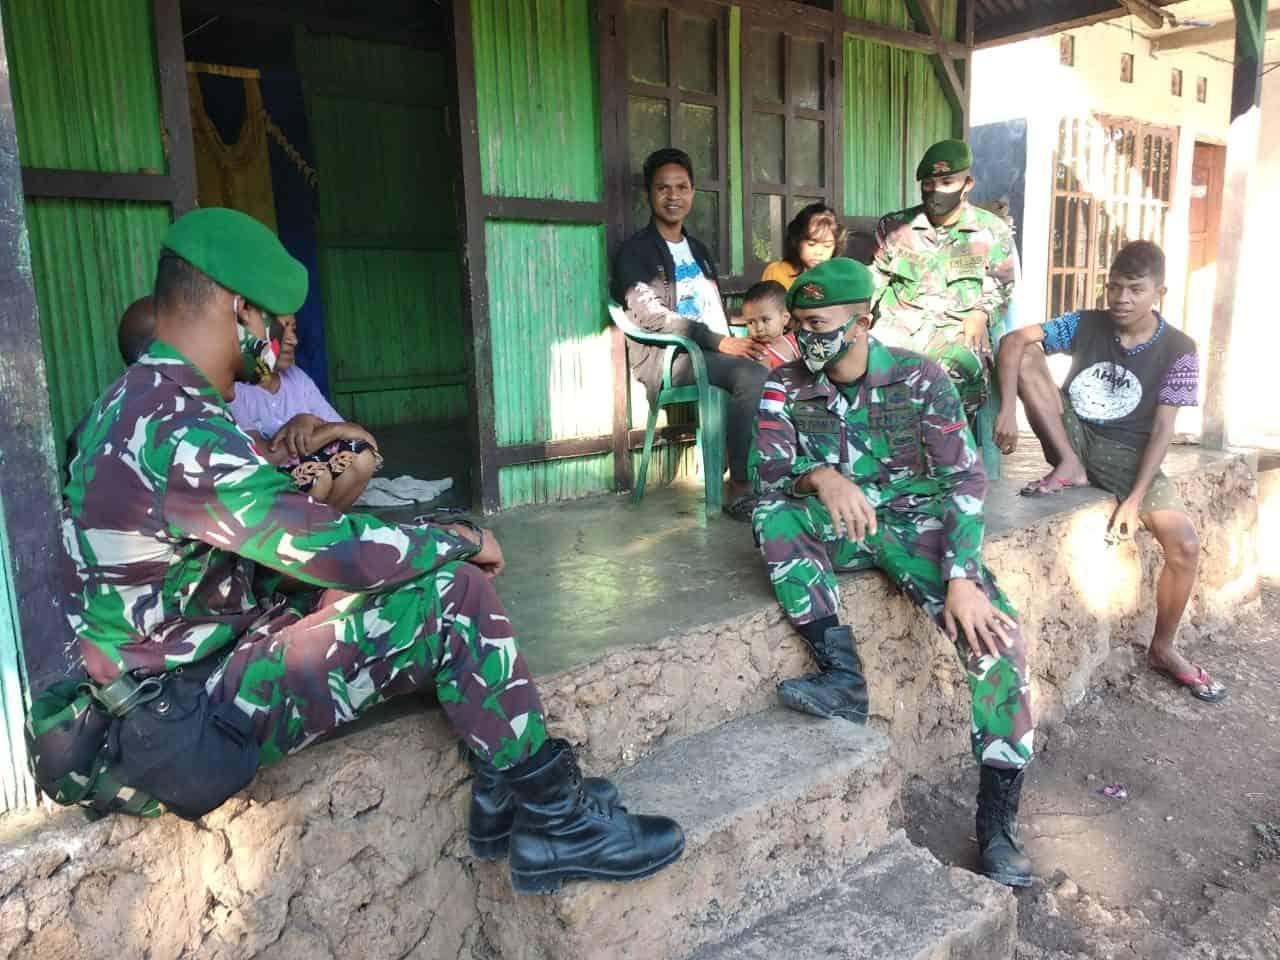 Anjangsana ke Warga Binaan, Satgas Yonif 742 Bangun Keharmonisan Dengan Masyarakat